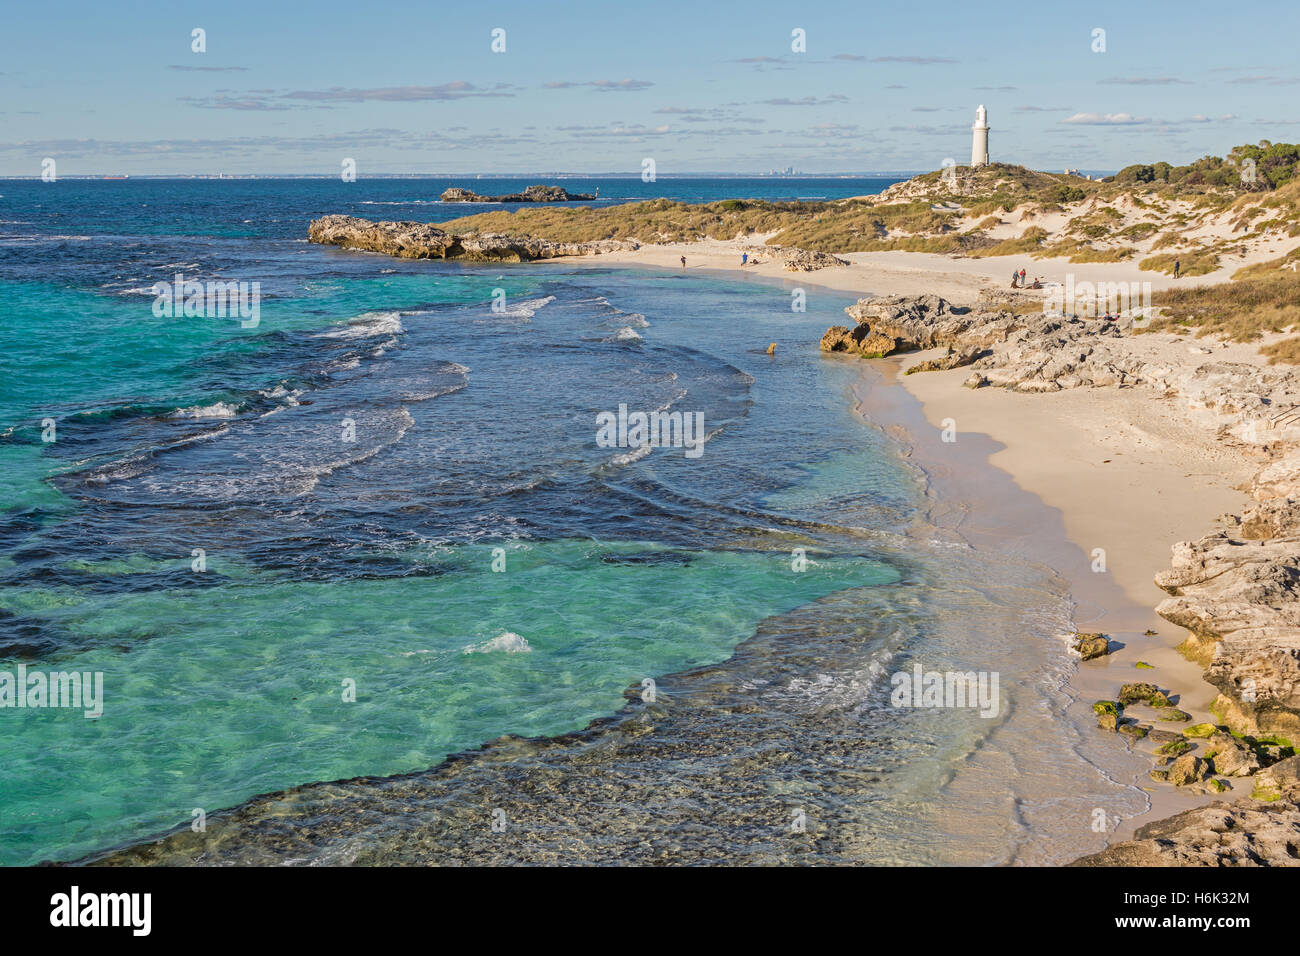 The Basin, Pinky Beach and Bathurst Lighthouse at Rottnest Island, near Perth in Western Australia. - Stock Image